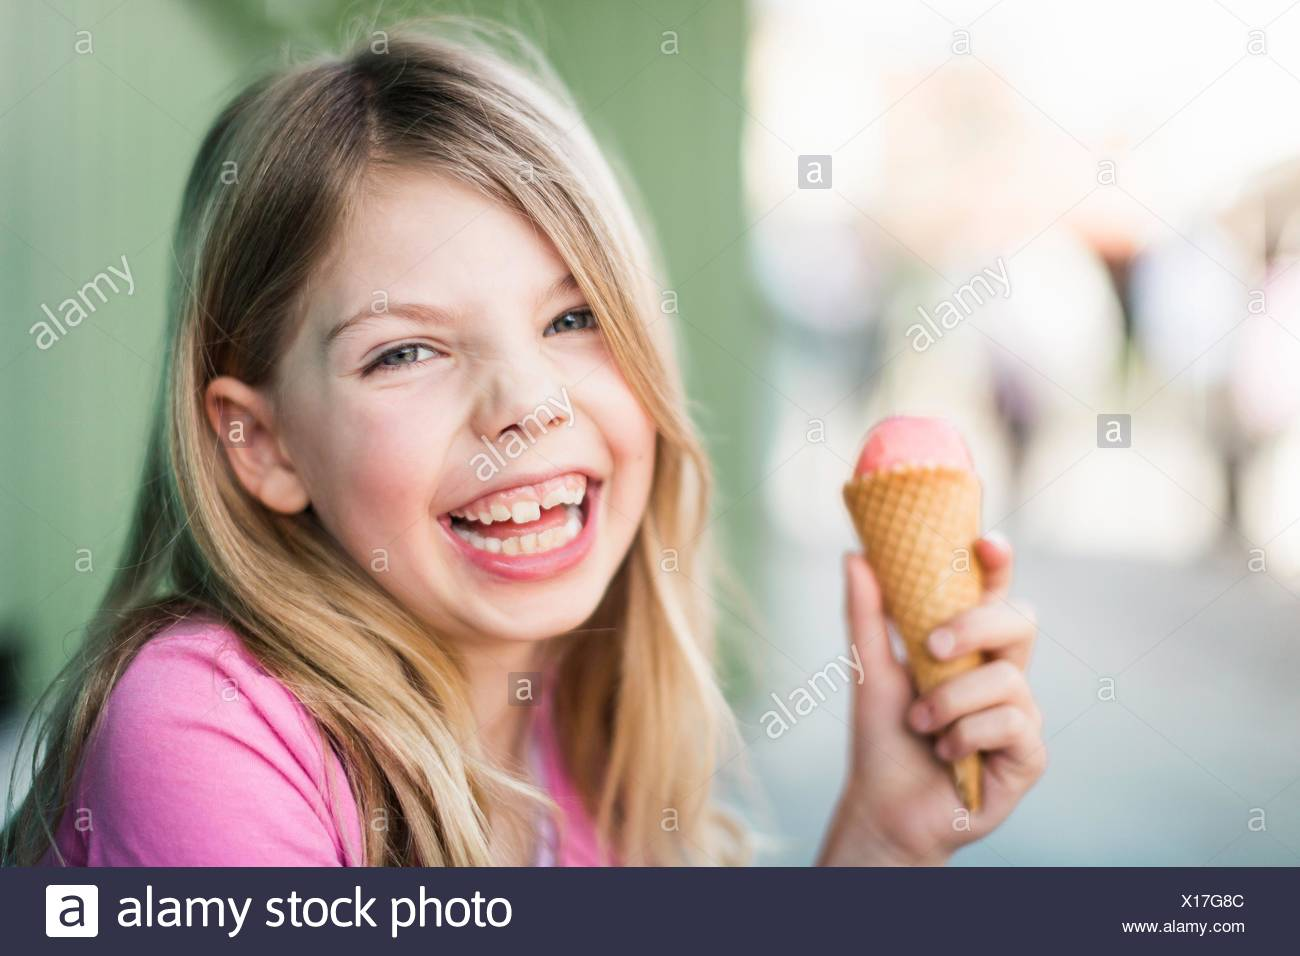 Porträt des jungen Mädchens essen Eis Stockbild